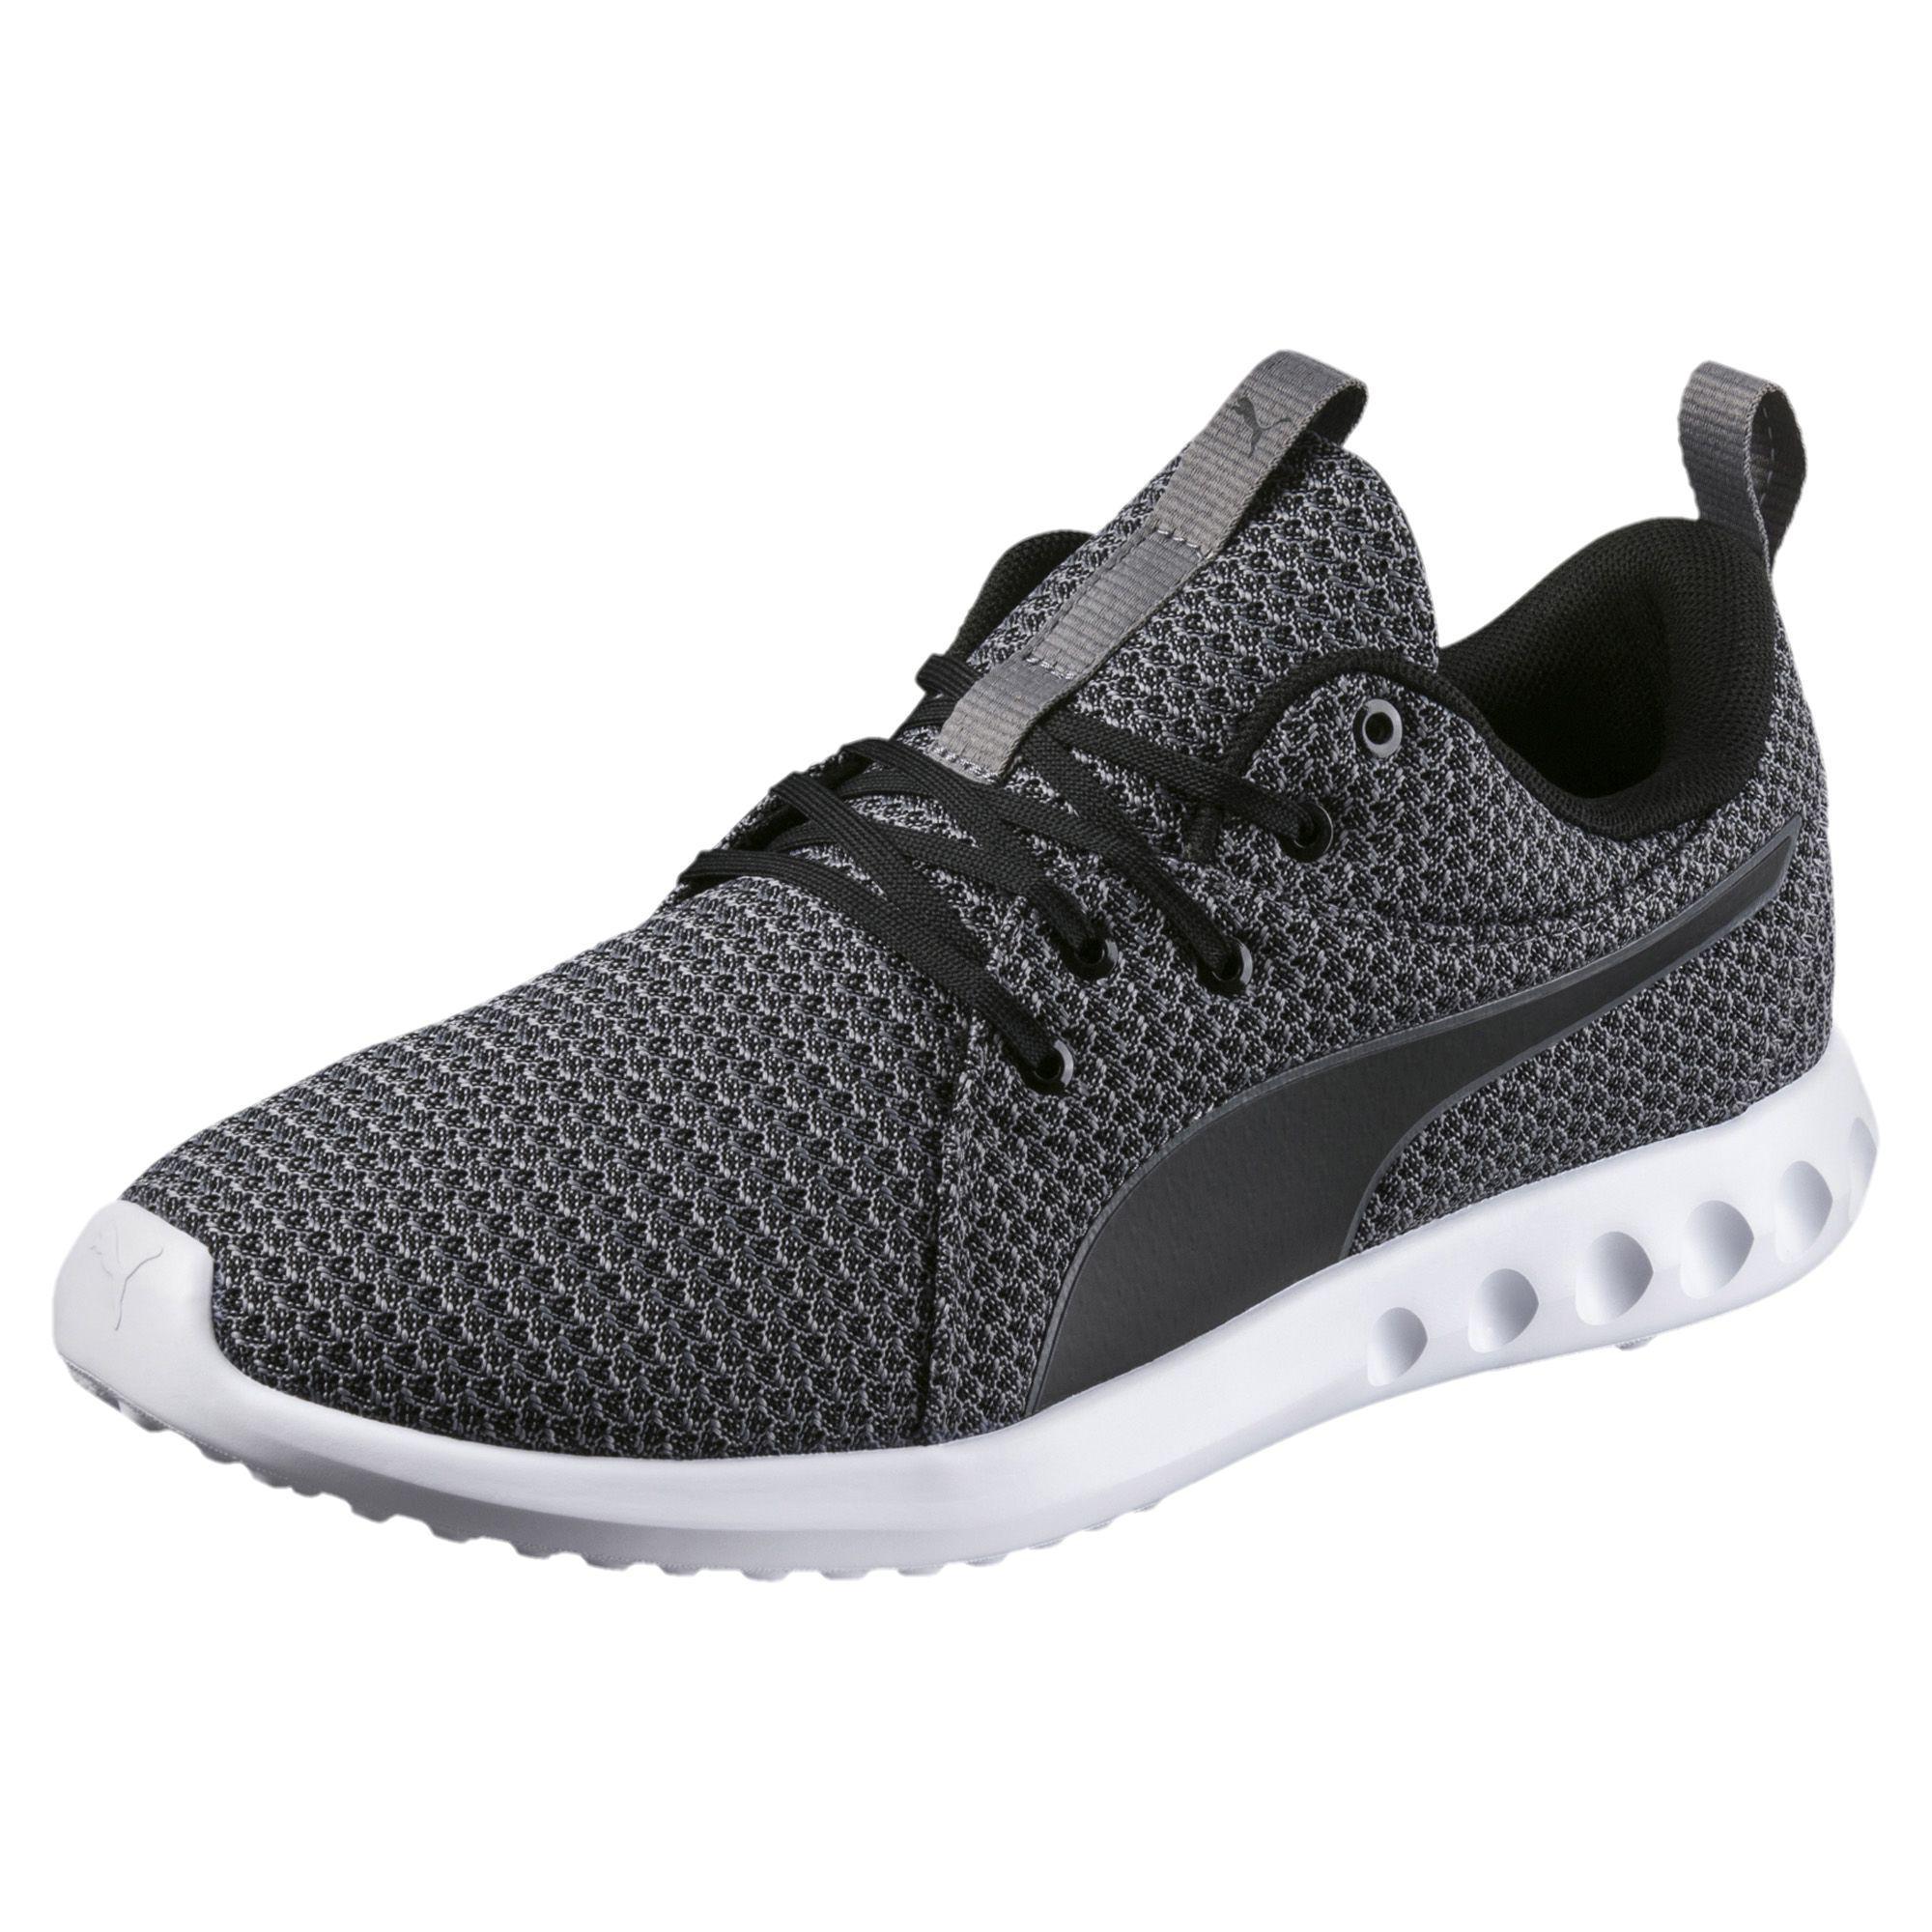 86175012c4e89d Lyst - PUMA Carson 2 Knit Men s Running Shoes in Black for Men